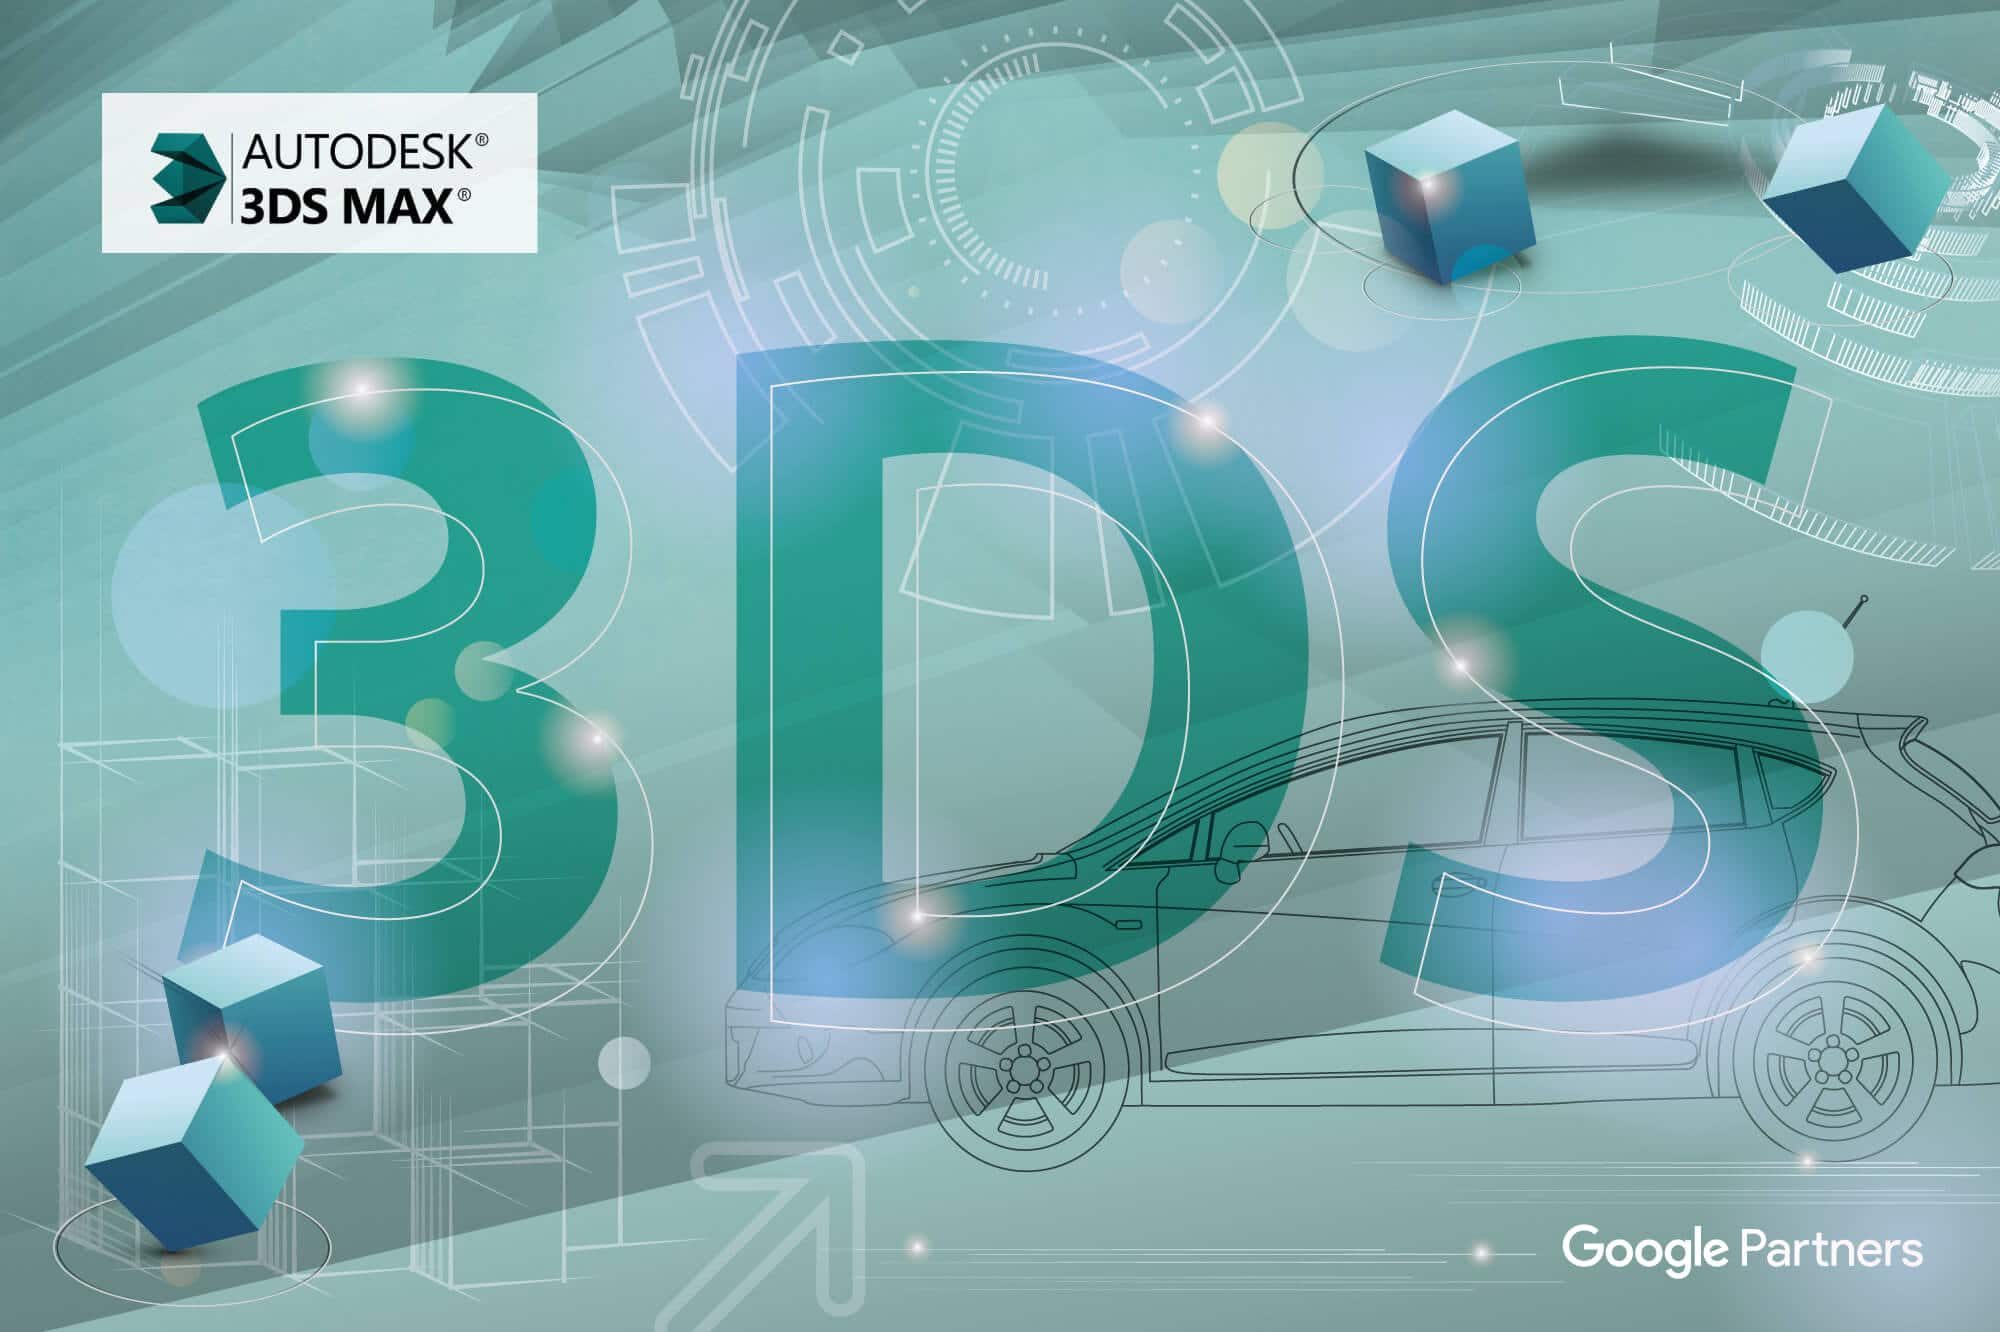 Autodesk-3DS-MAX-2000x1332-mod_I